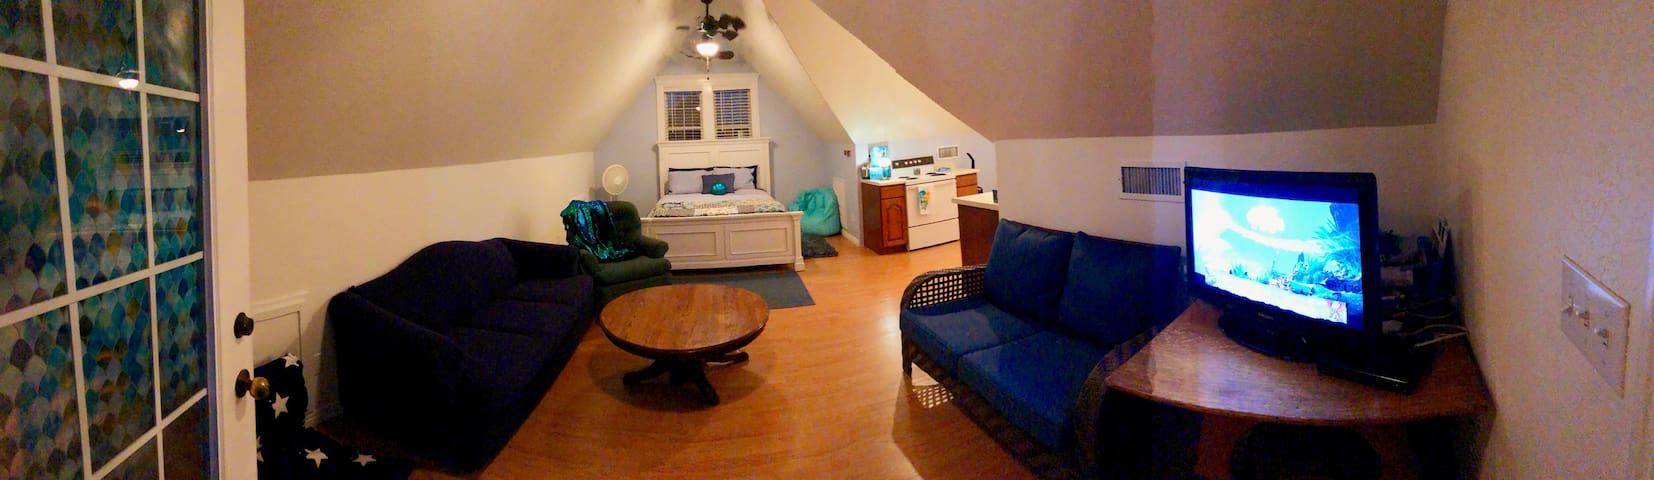 Mesquite 'Beach House' studio apartment.